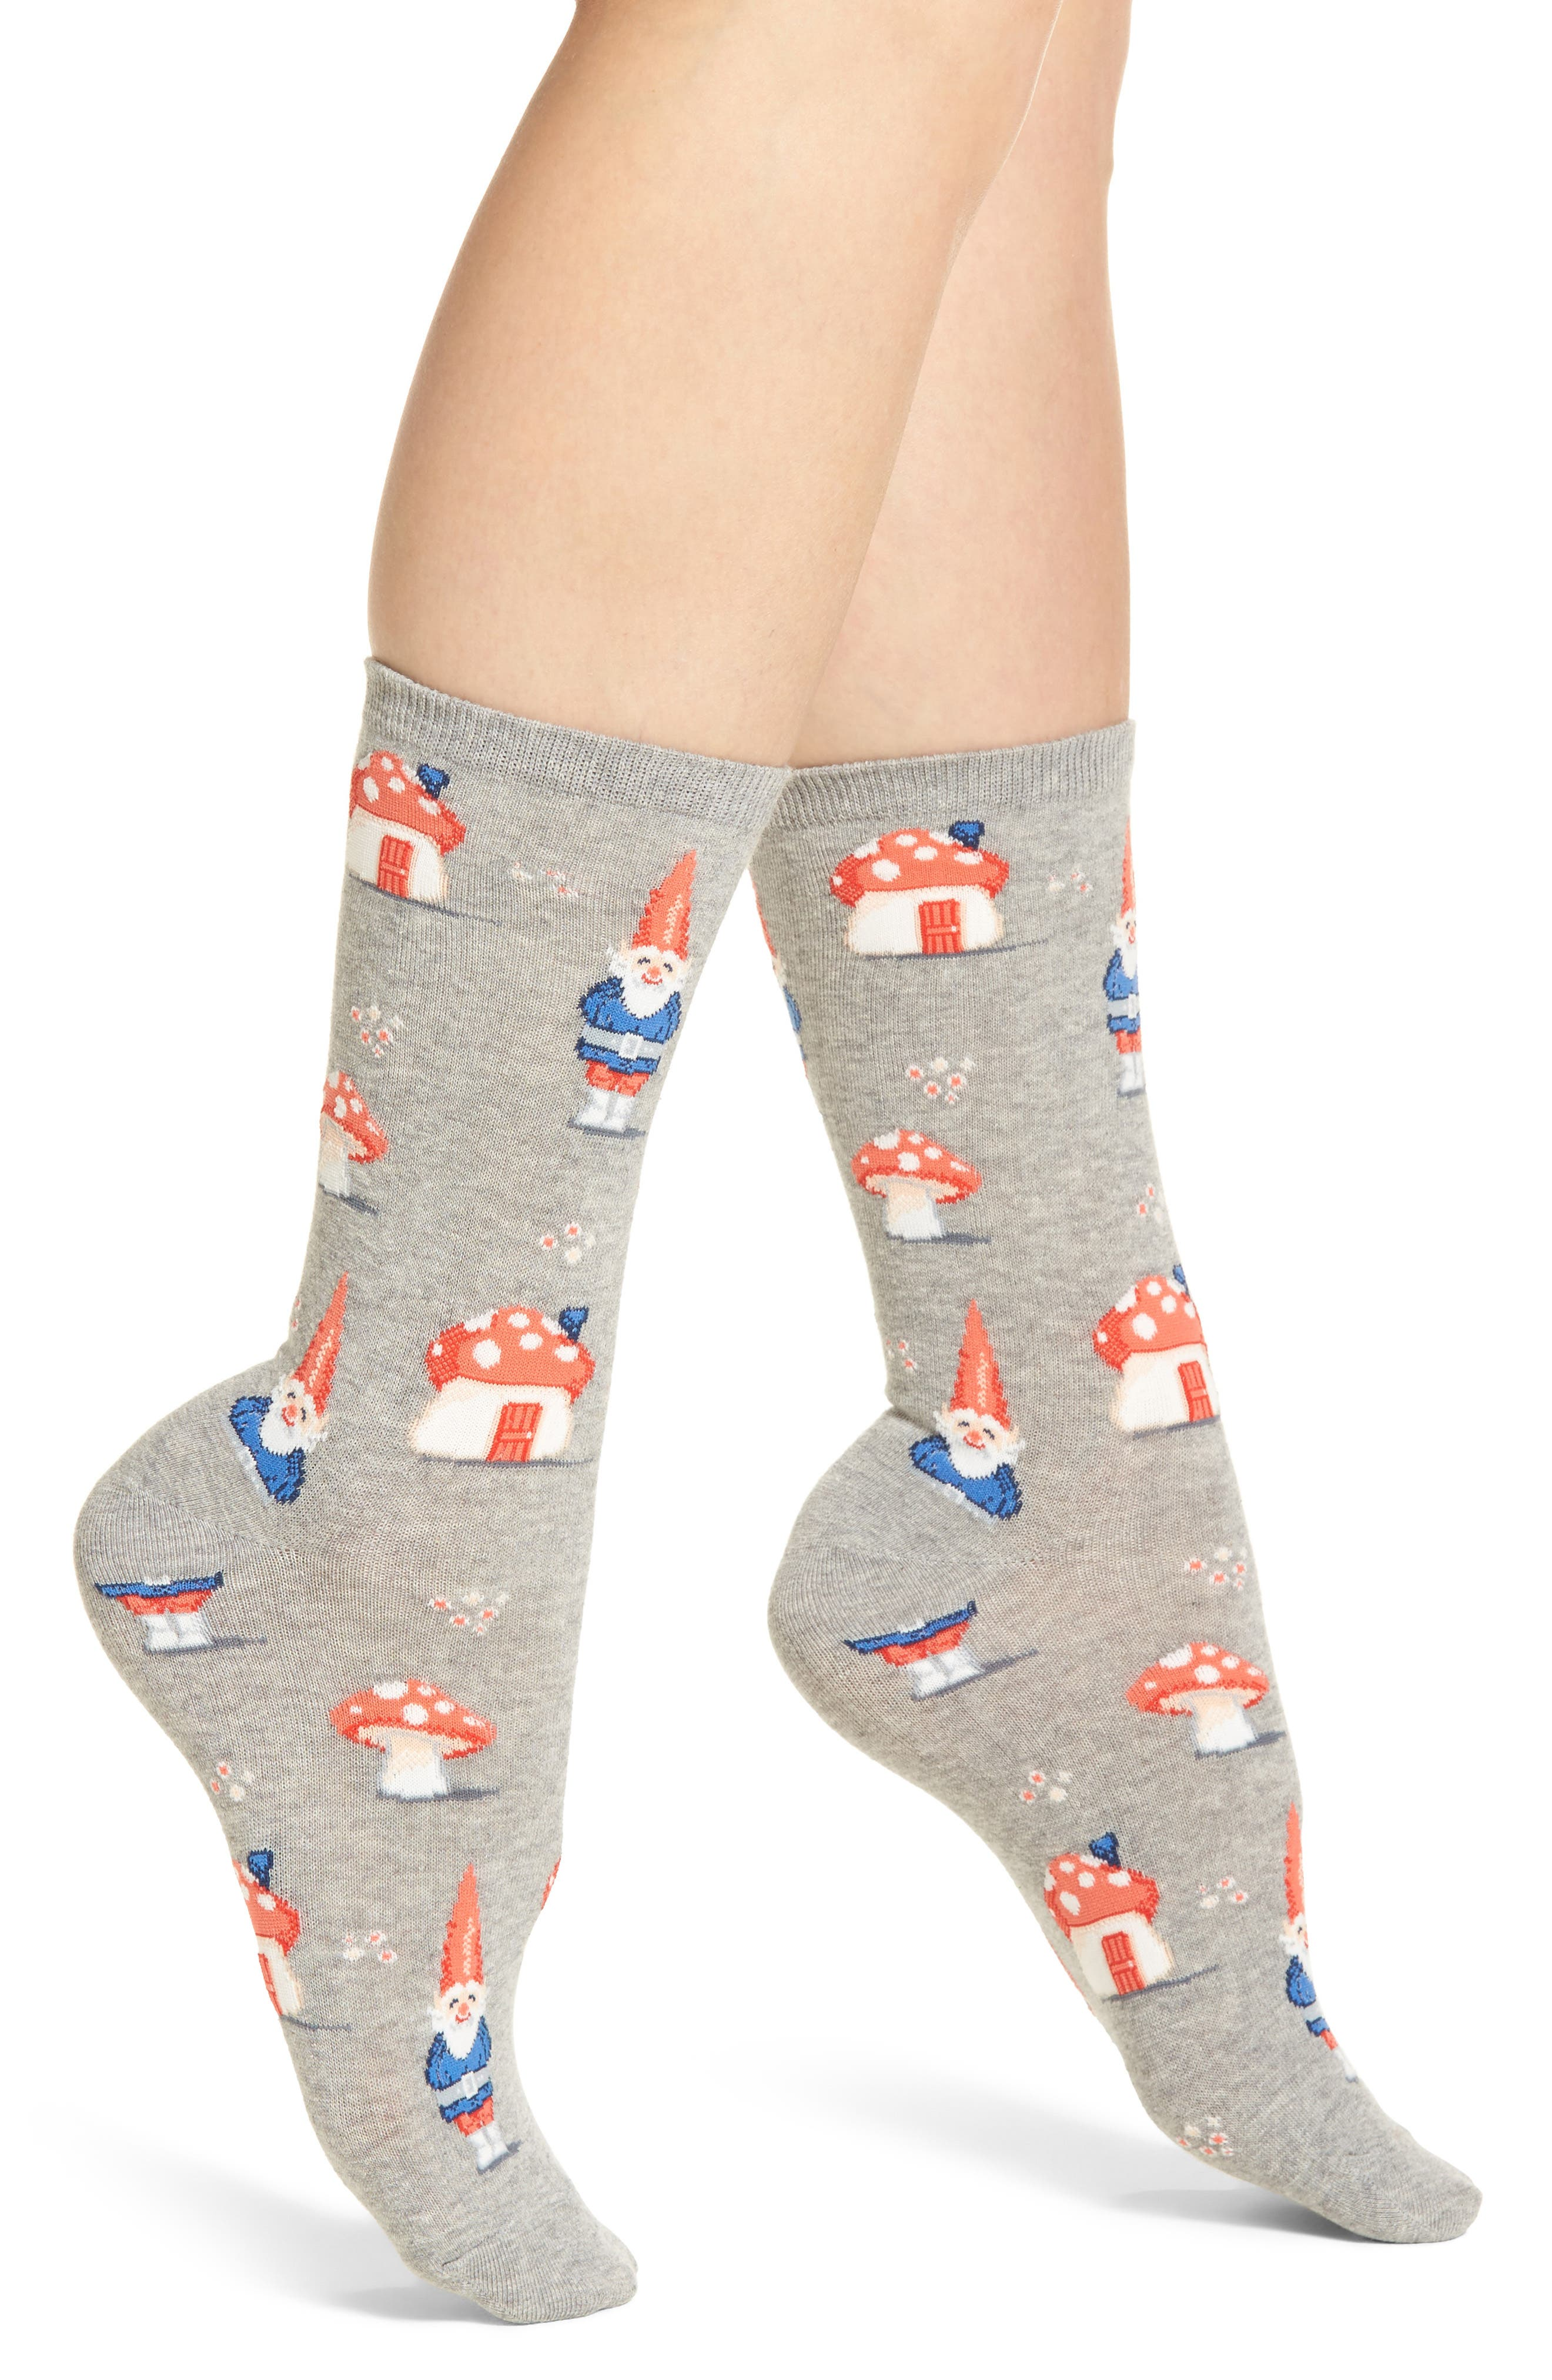 Hot Sox Gnomes Crew Socks